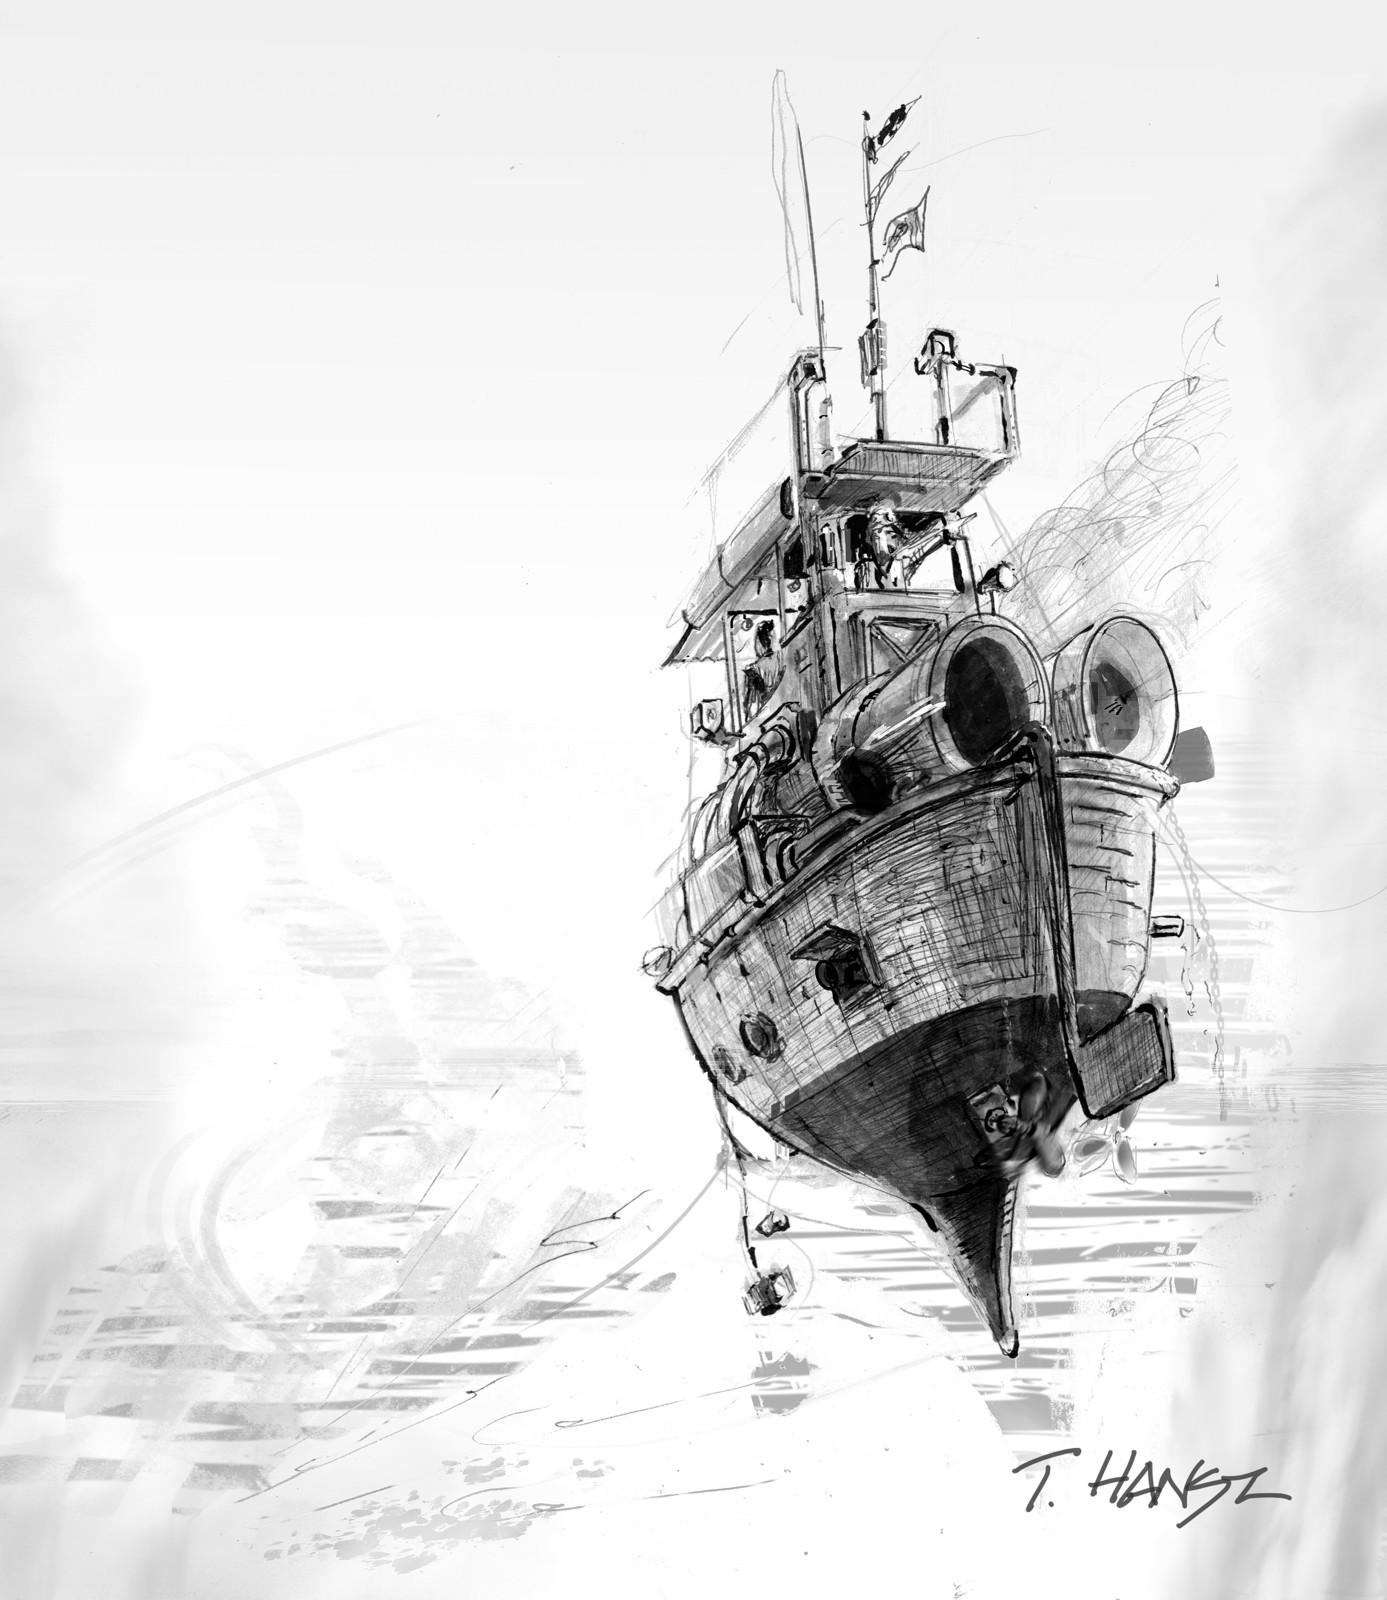 Tim Hansz ink sketch